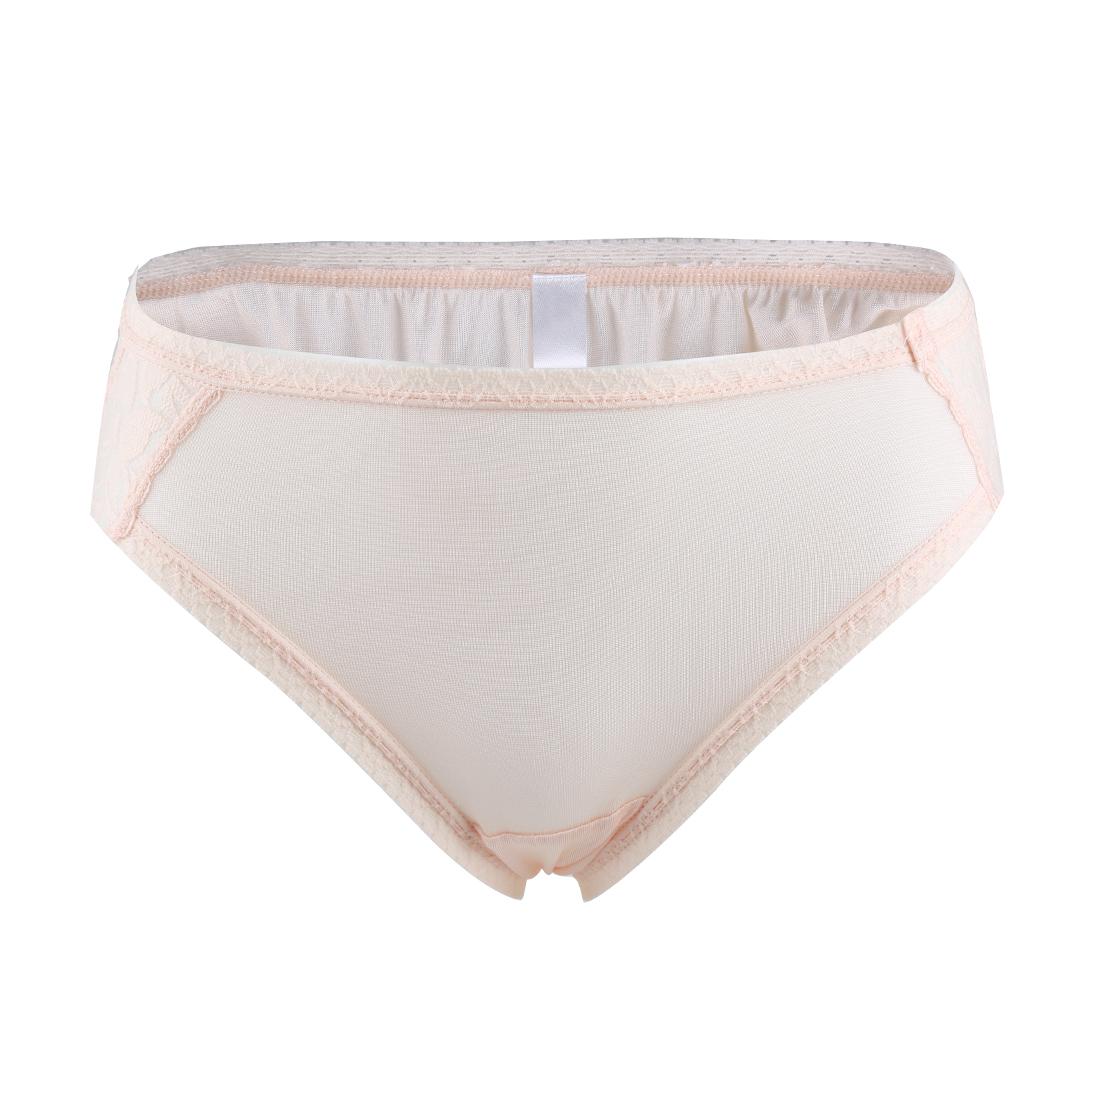 Women Natural Silk Laced Breathable Translucent Hi-Cut Panties Light Pink Large